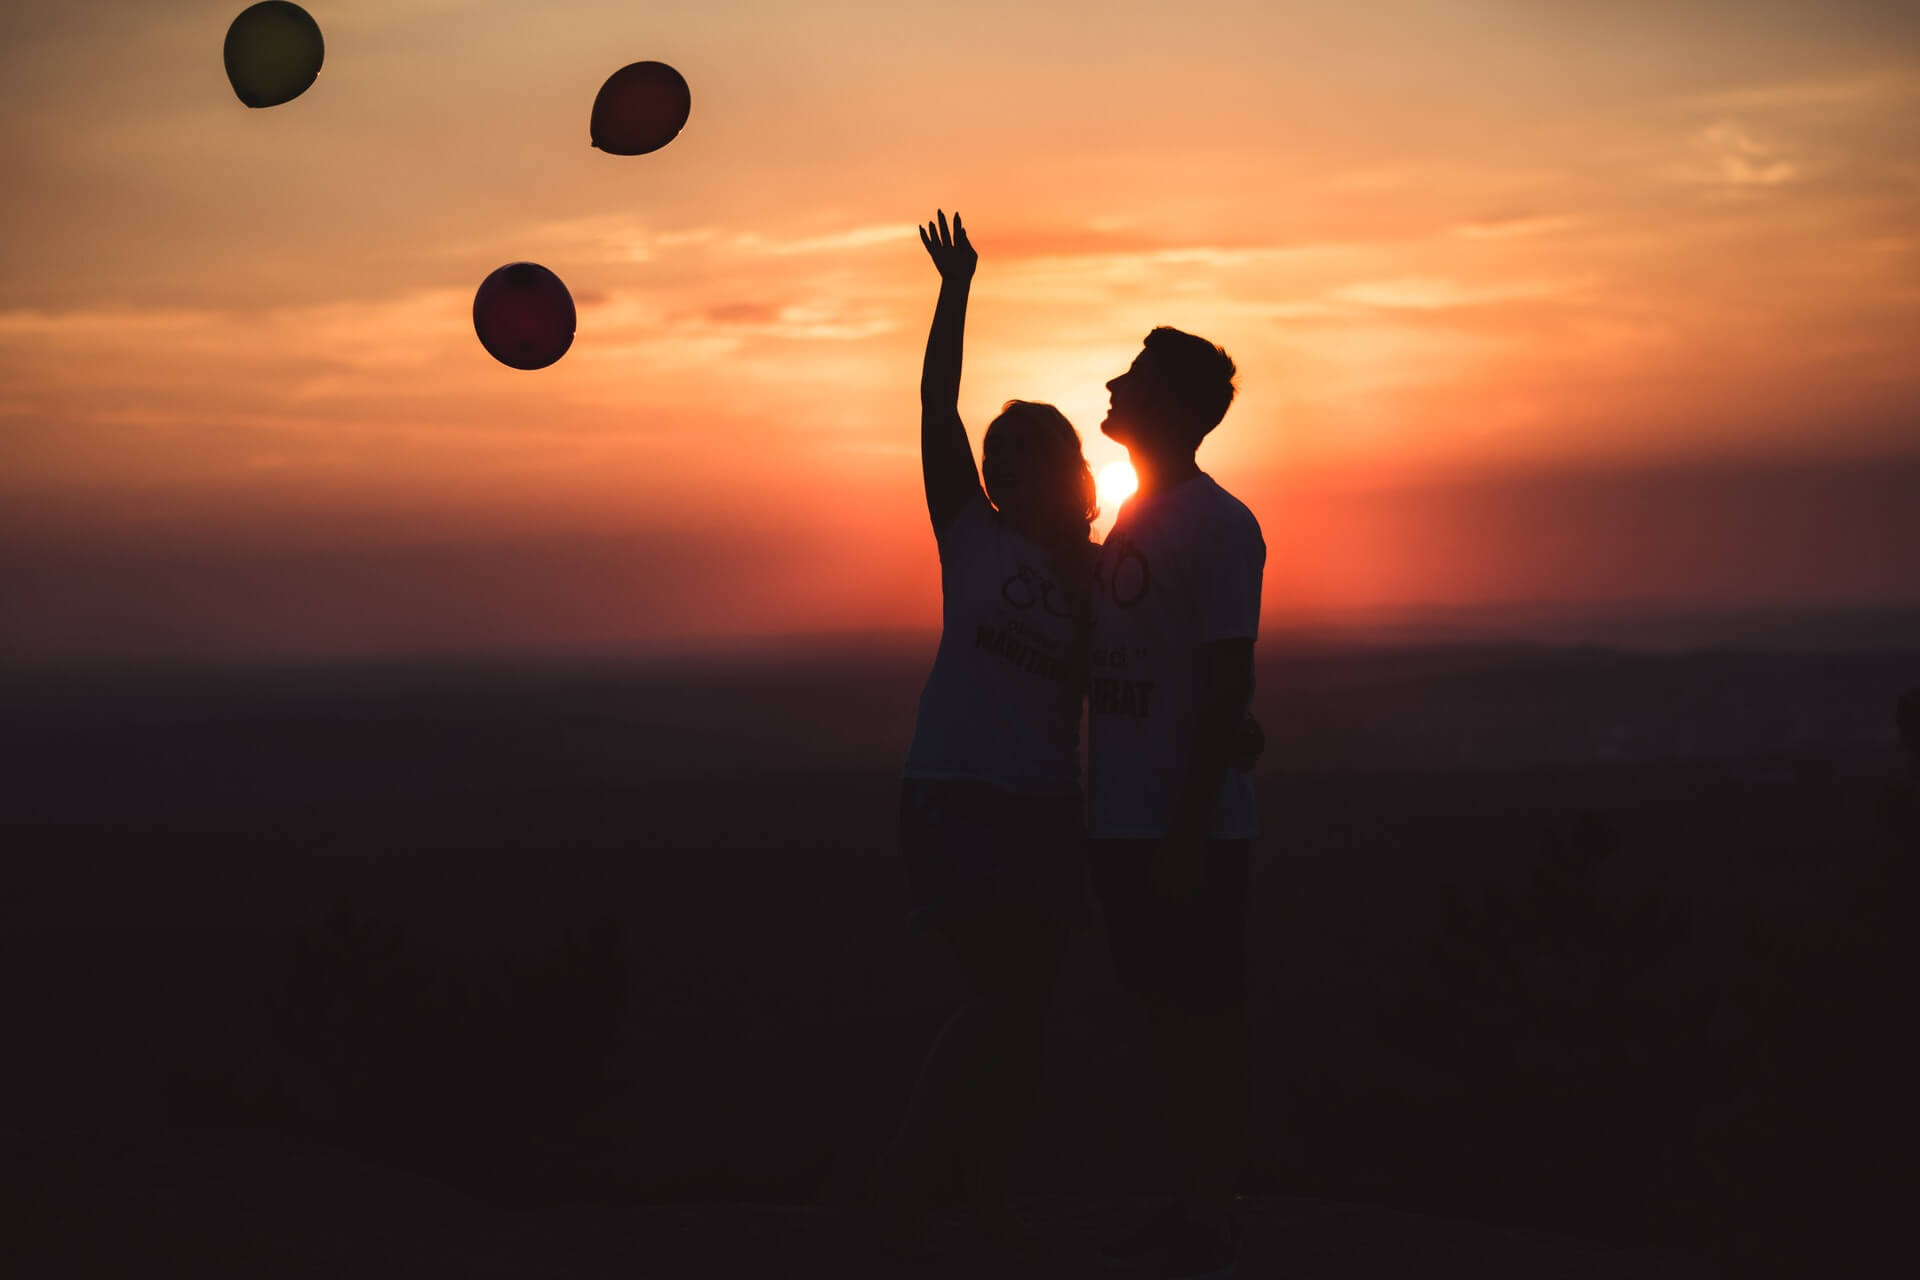 Soziale Beziehungen pflegen - Ziele im Leben